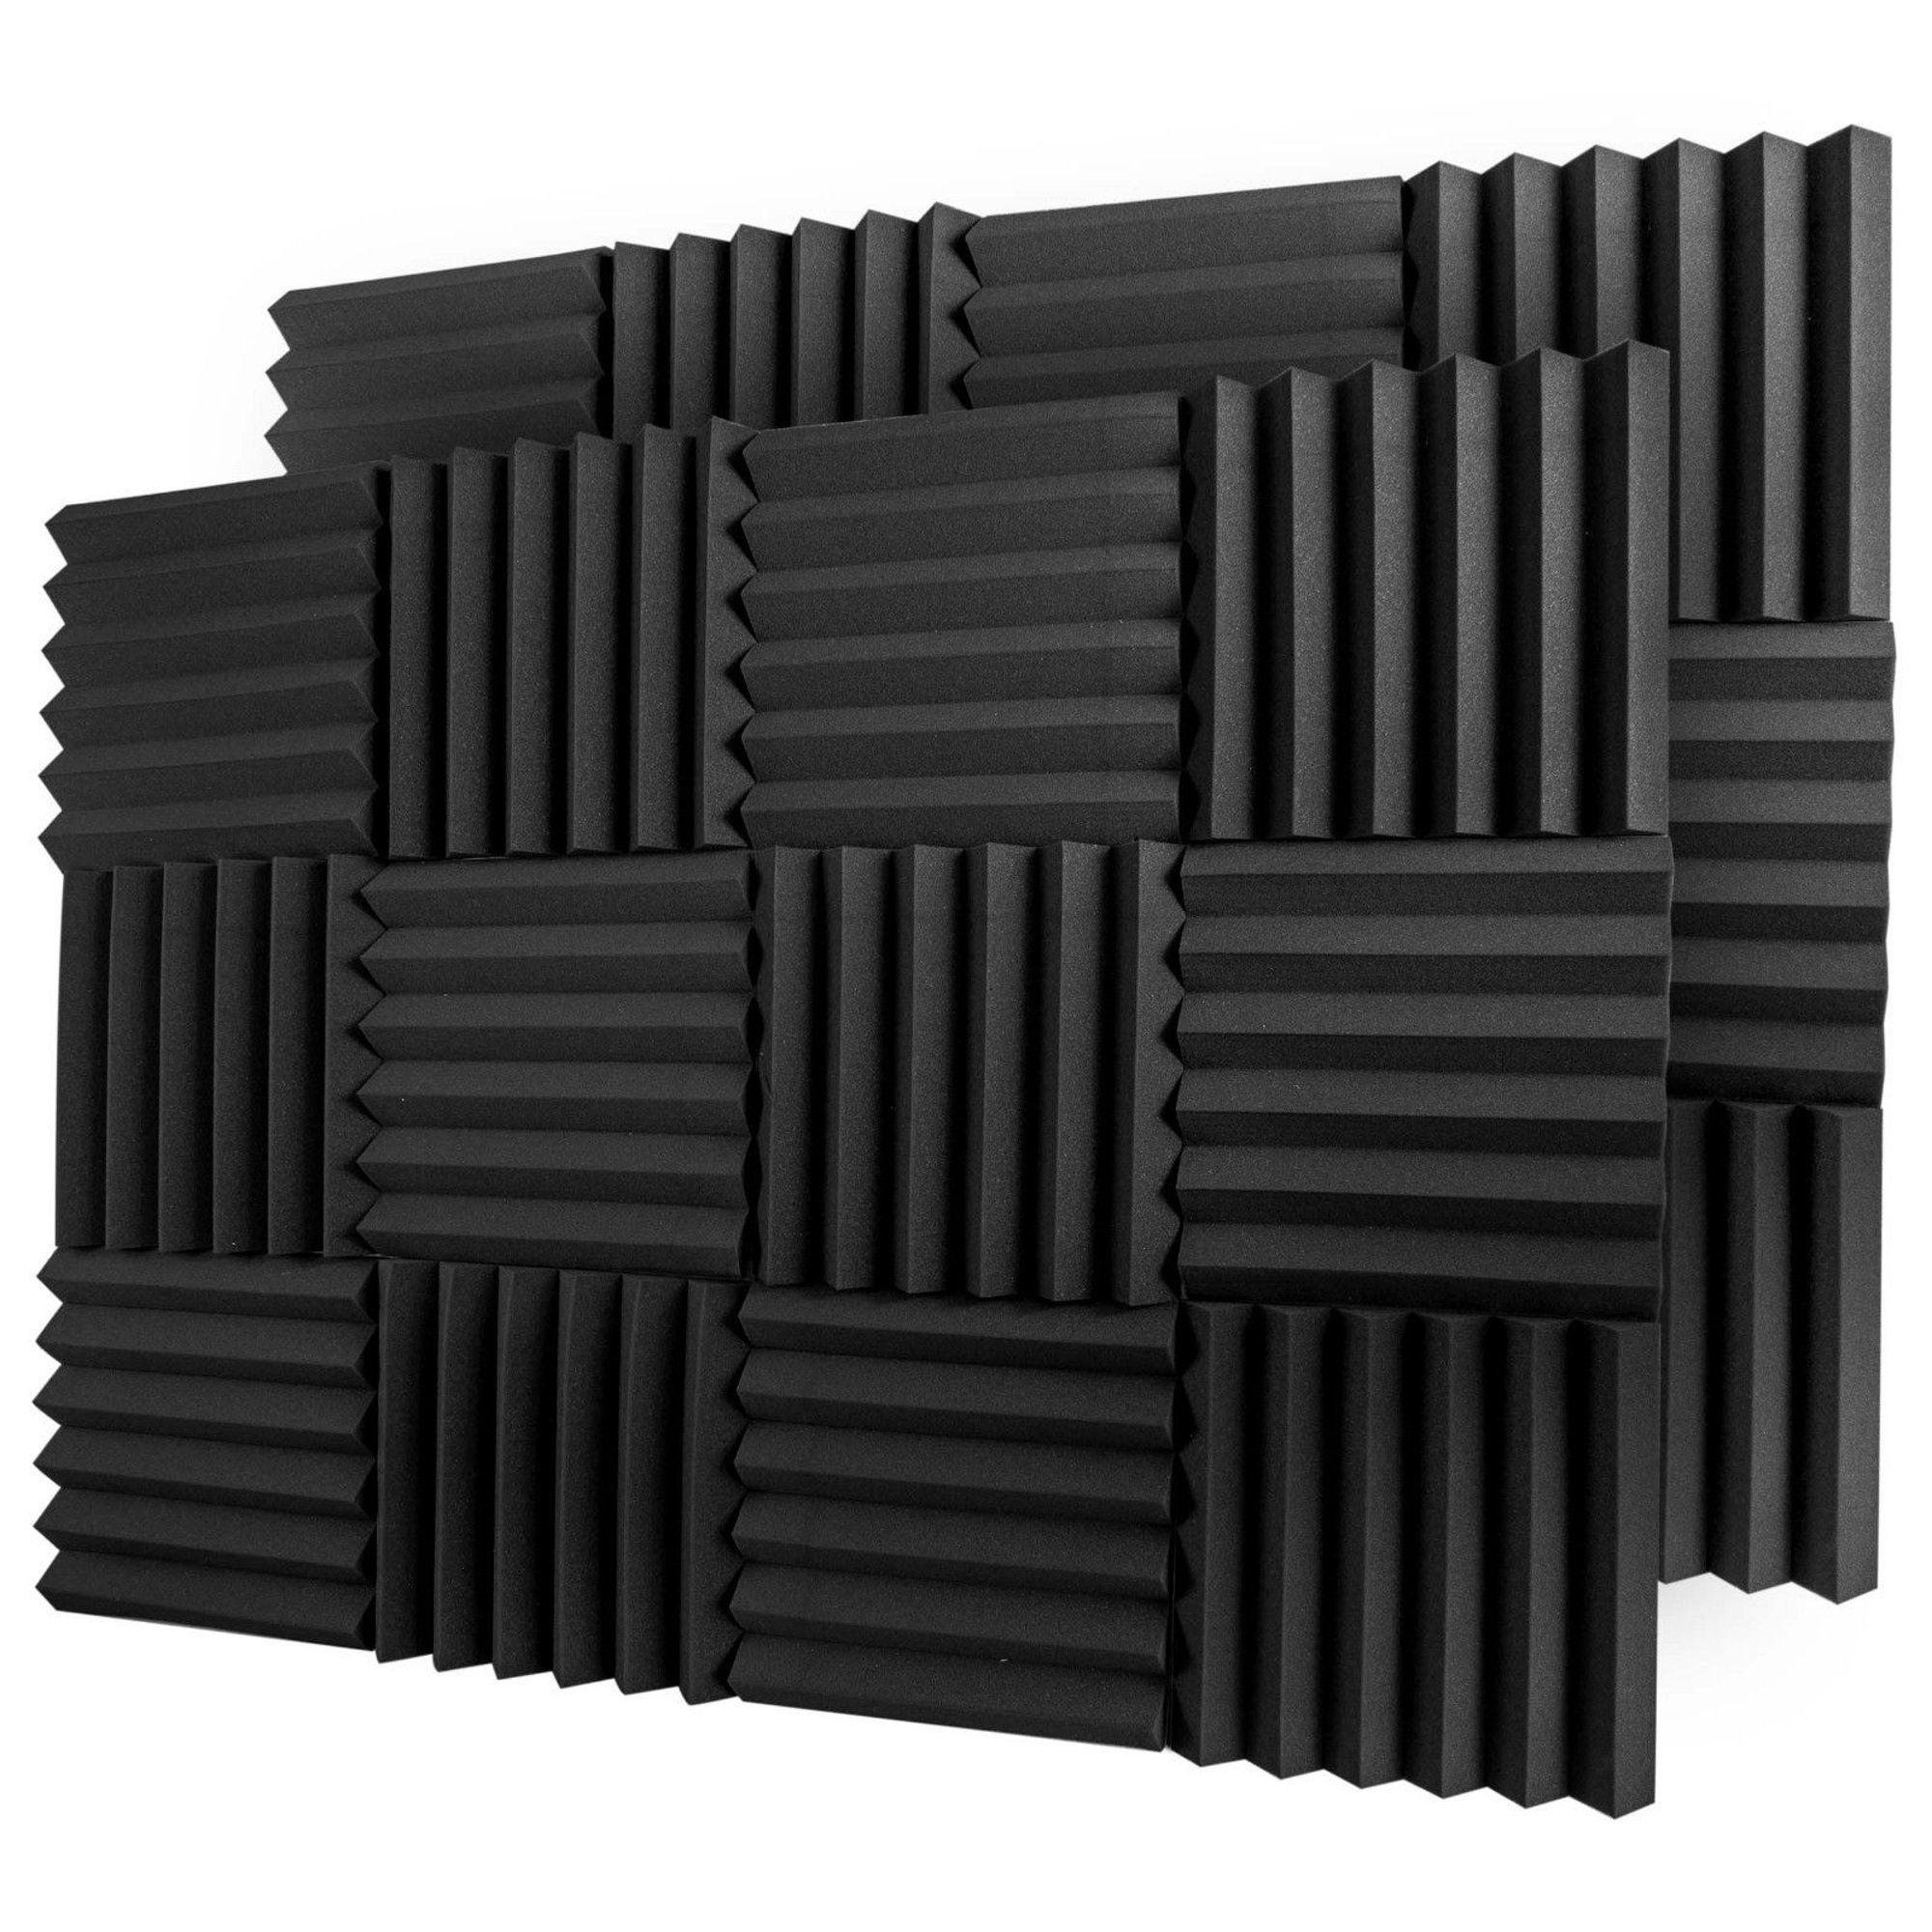 Bookishbunny 12 Pks Acoustic Foam Tiles Wall Record Studio Sound Proof 12 X 12 X 2 Fire Resistant Panels Black Walmart Com In 2020 Studio Foam Sound Proofing Foam Panels